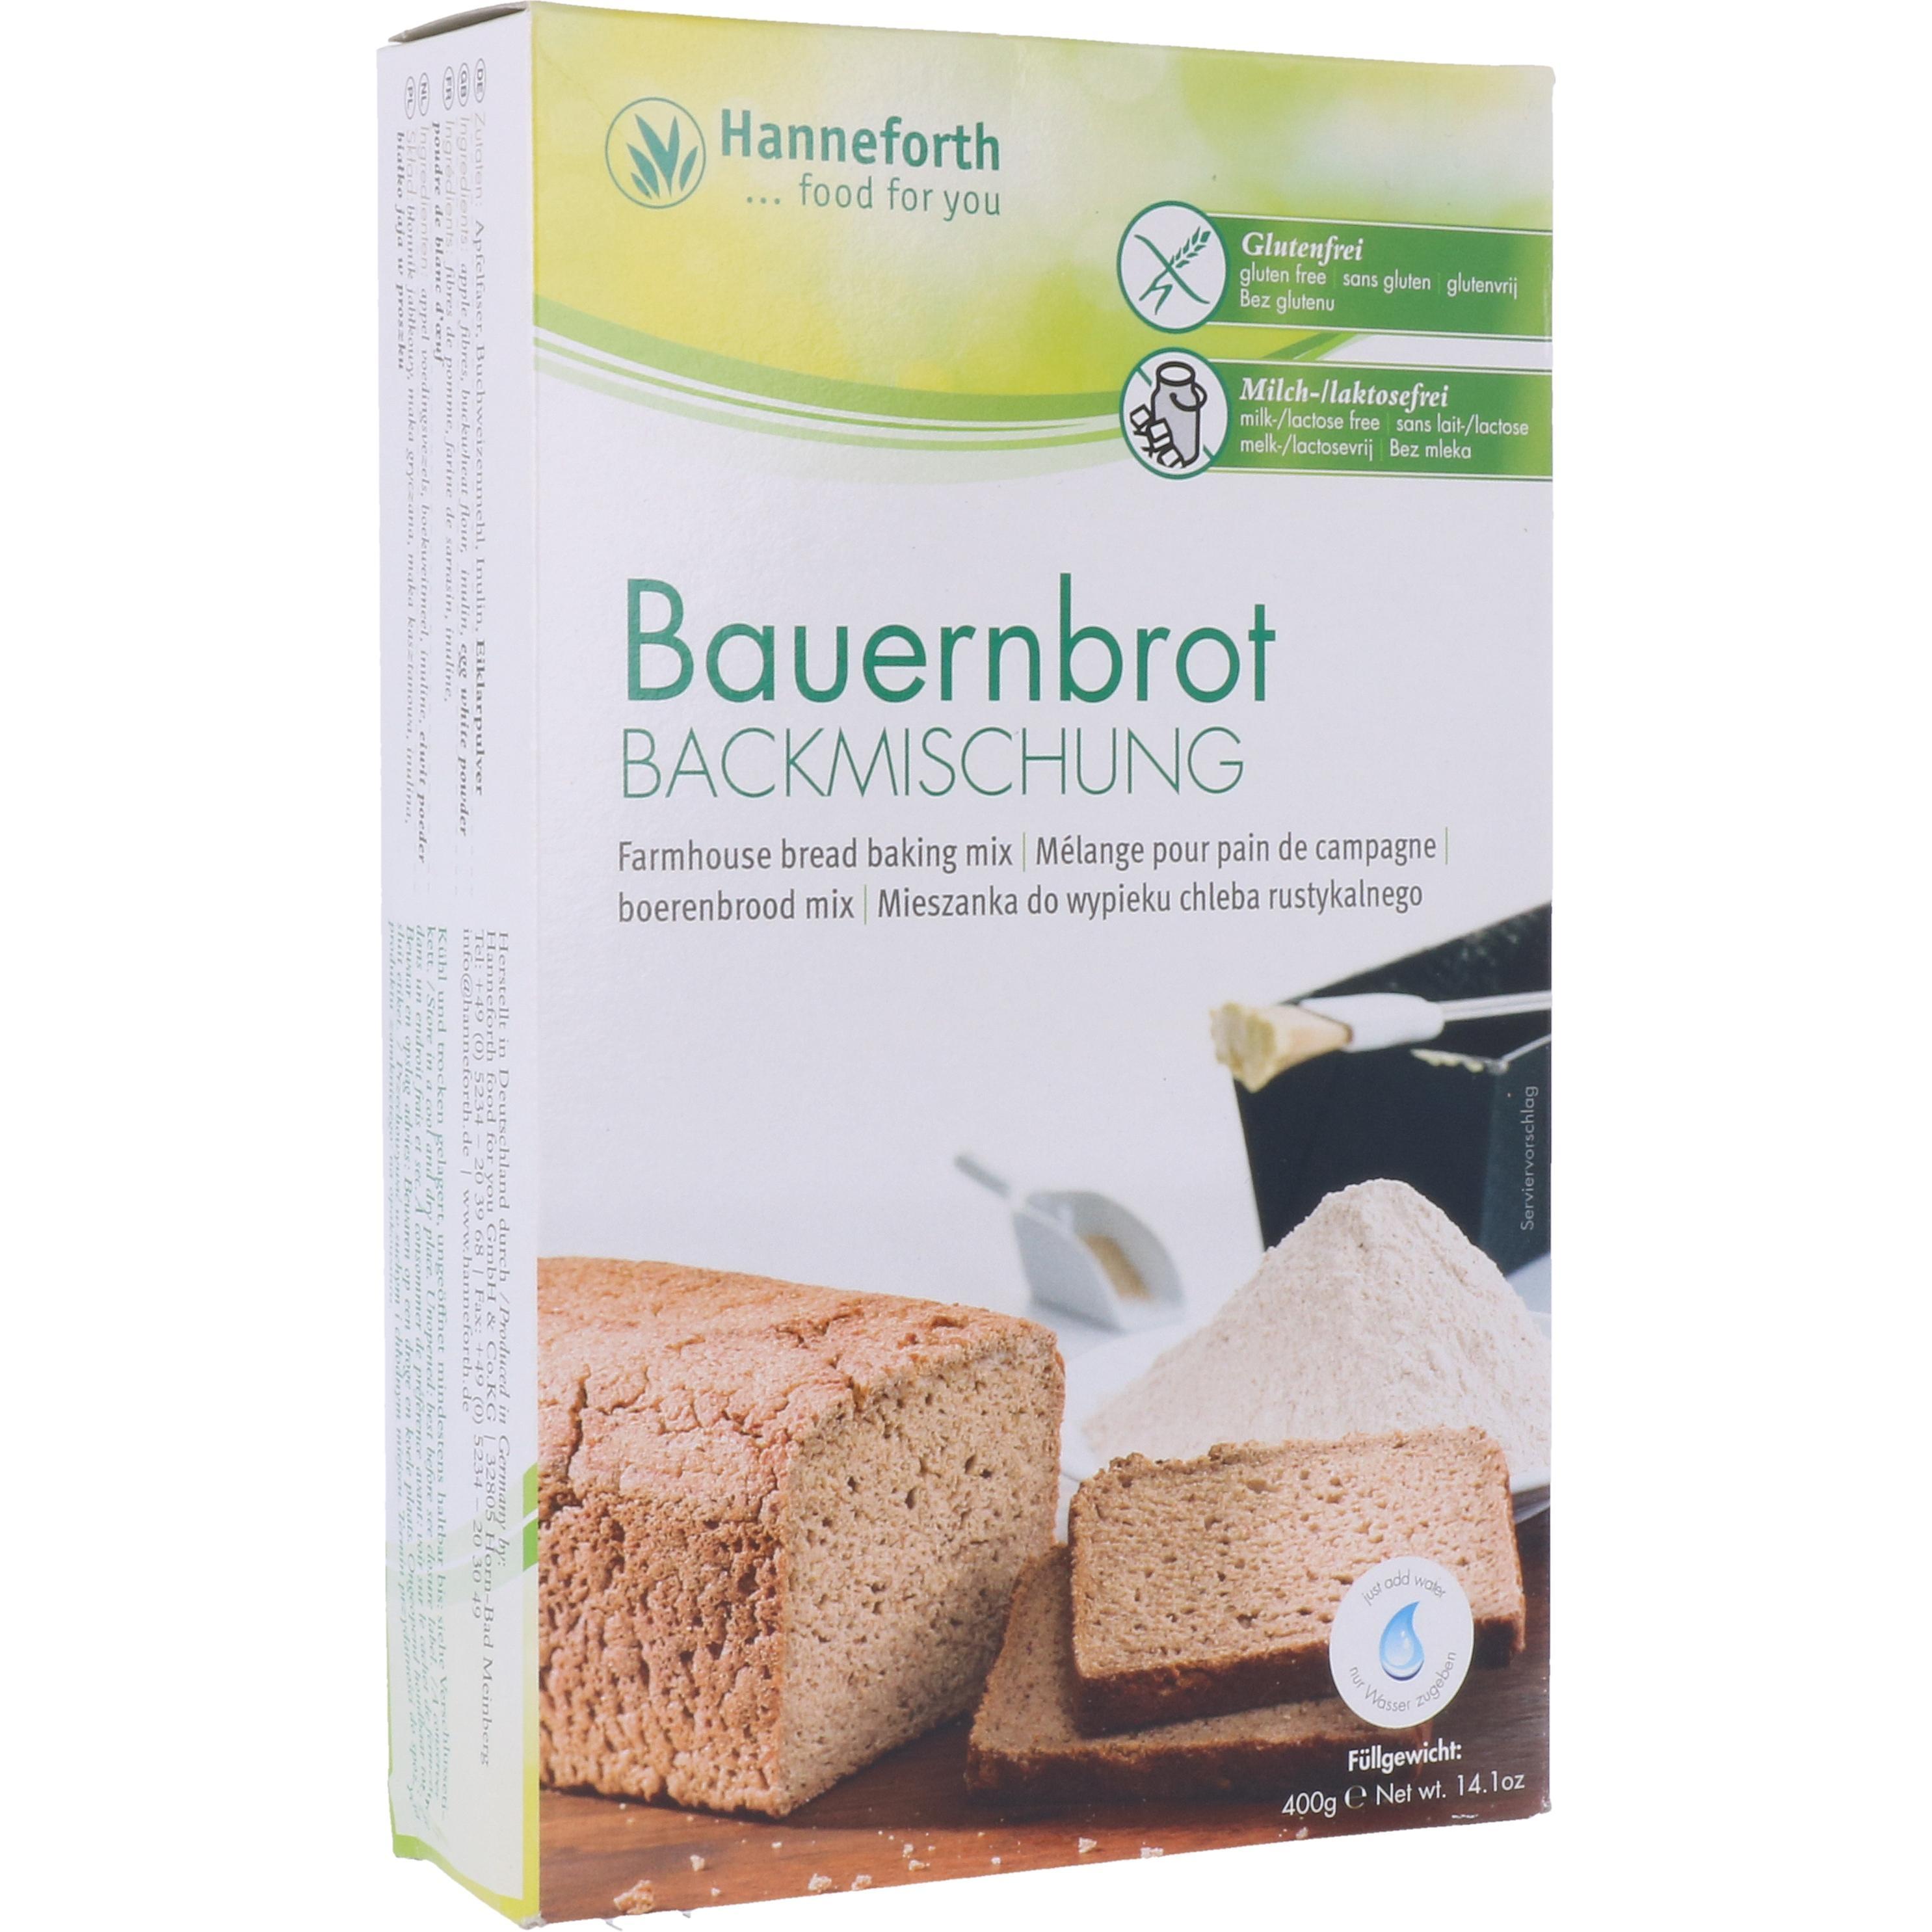 Hanneforth, food for you Backmischung für Bauernbrot 400g